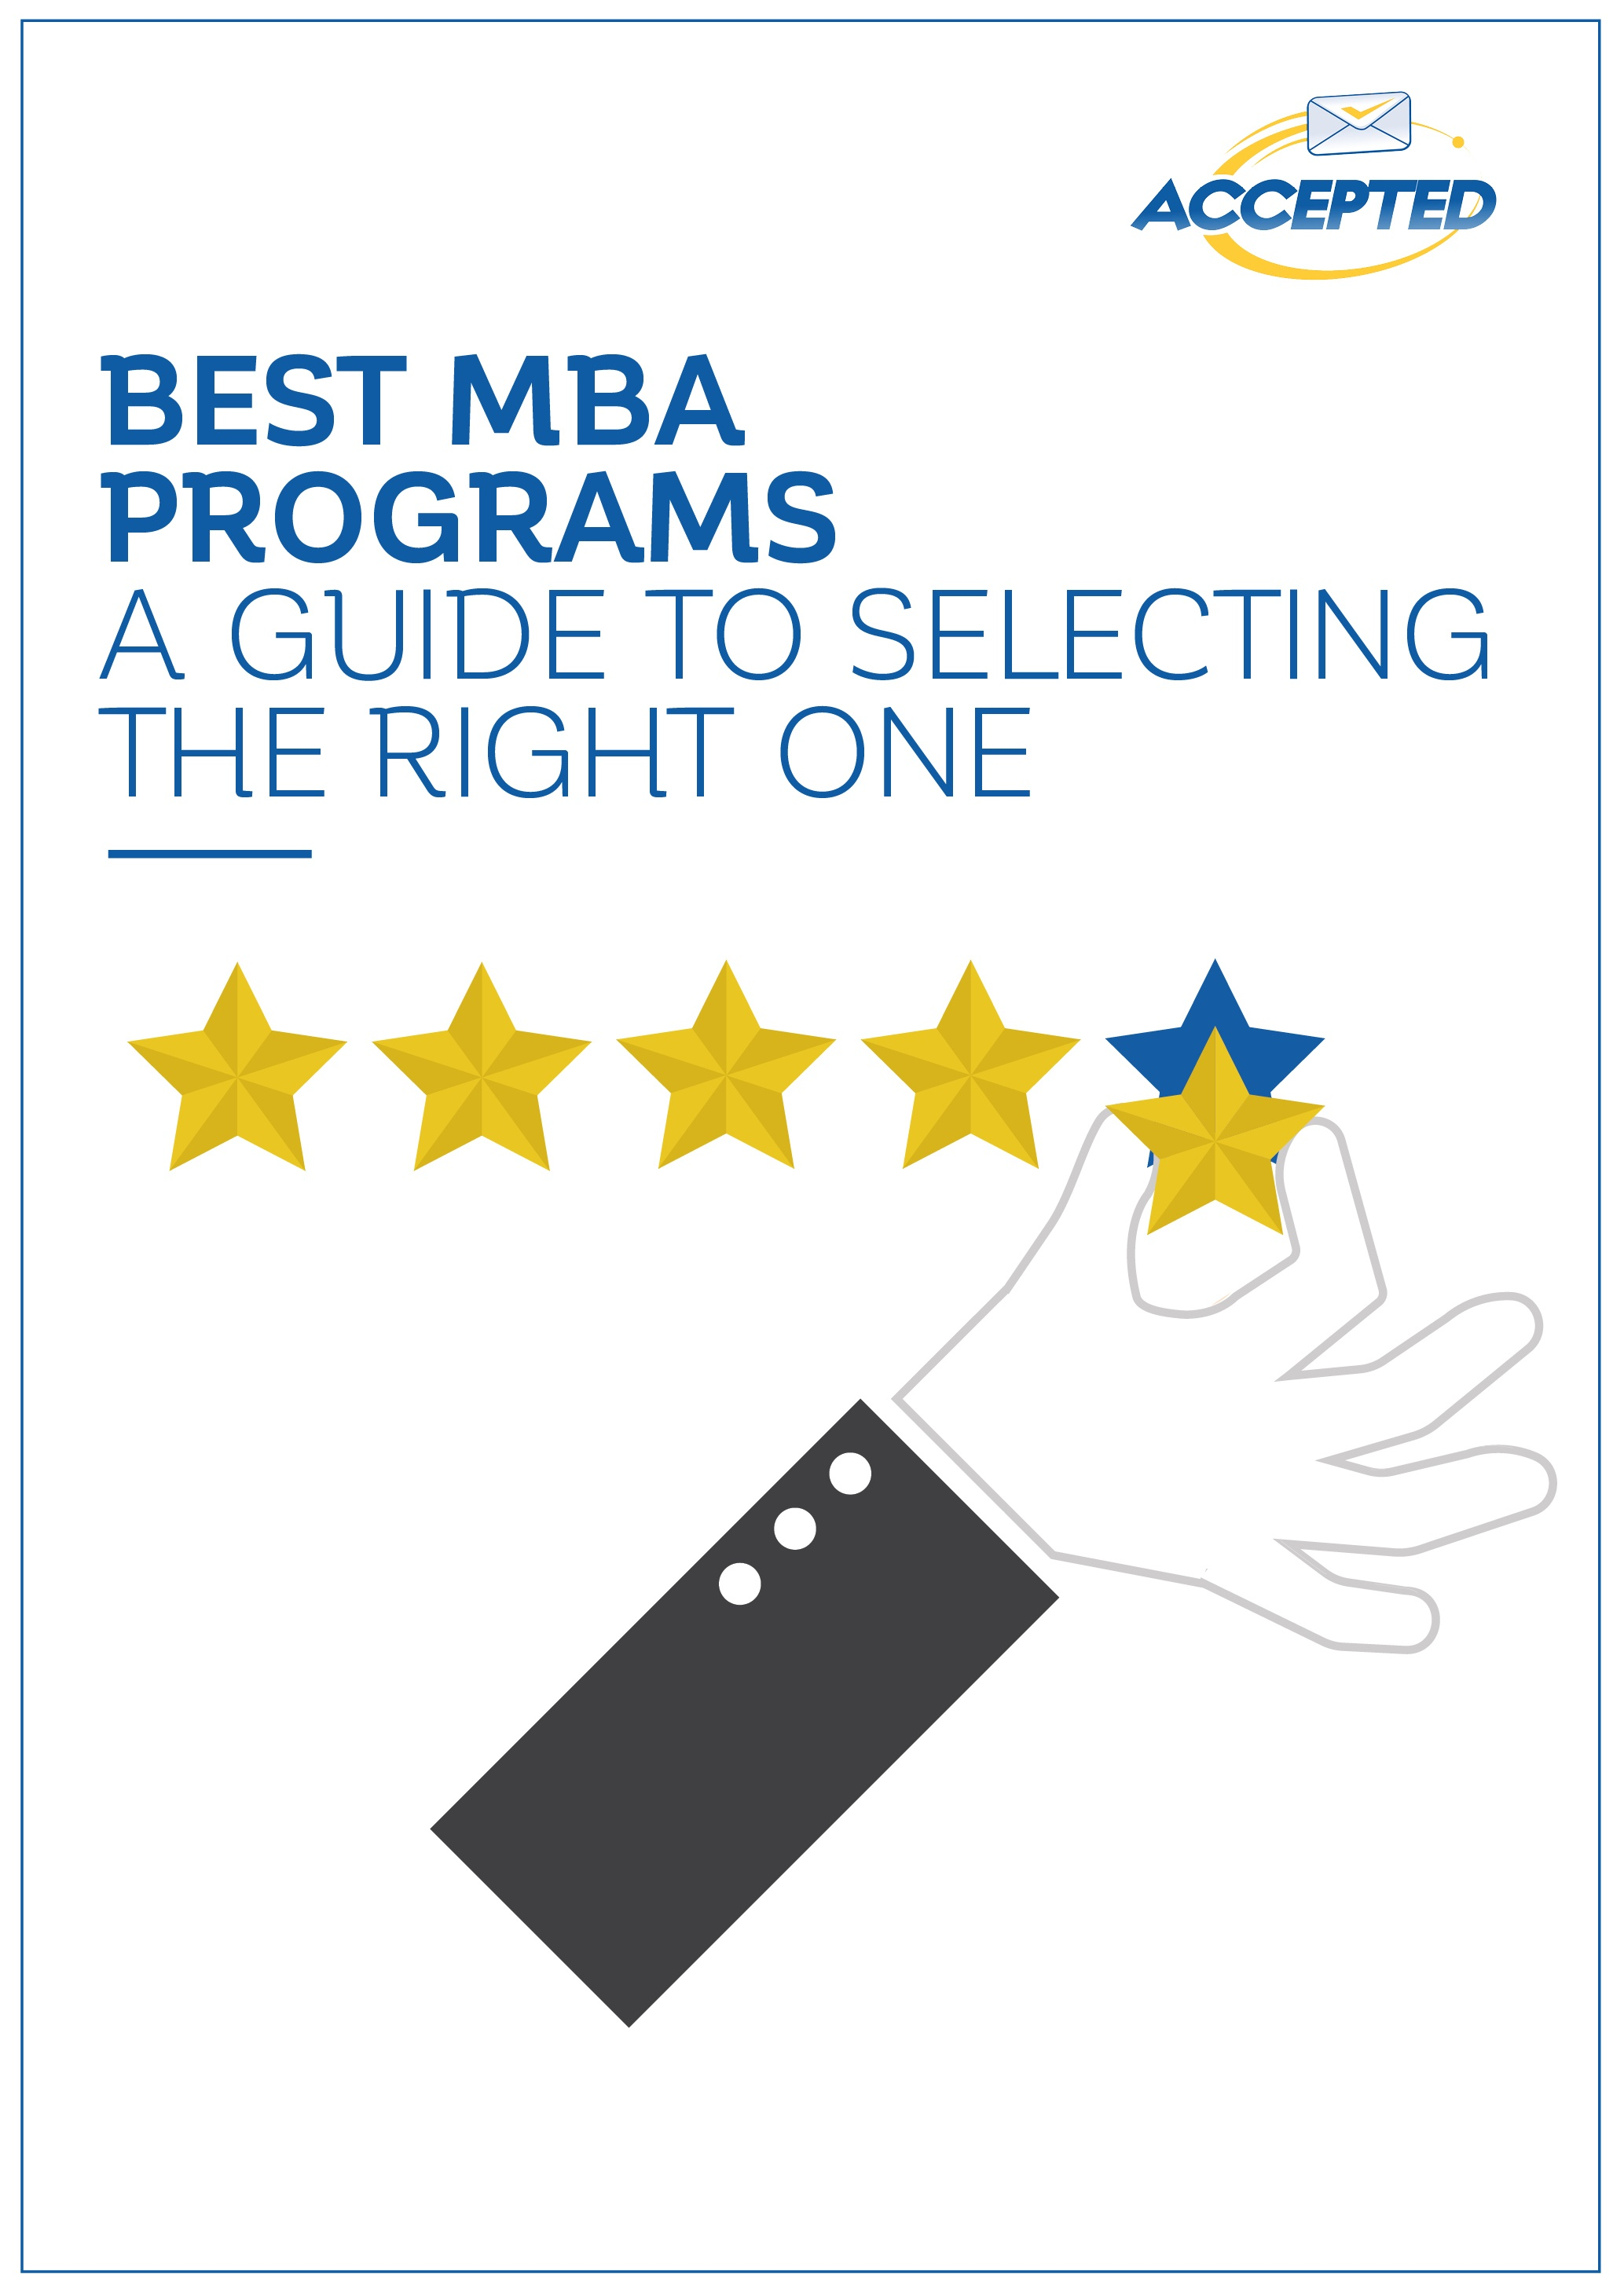 Best MBA Programs